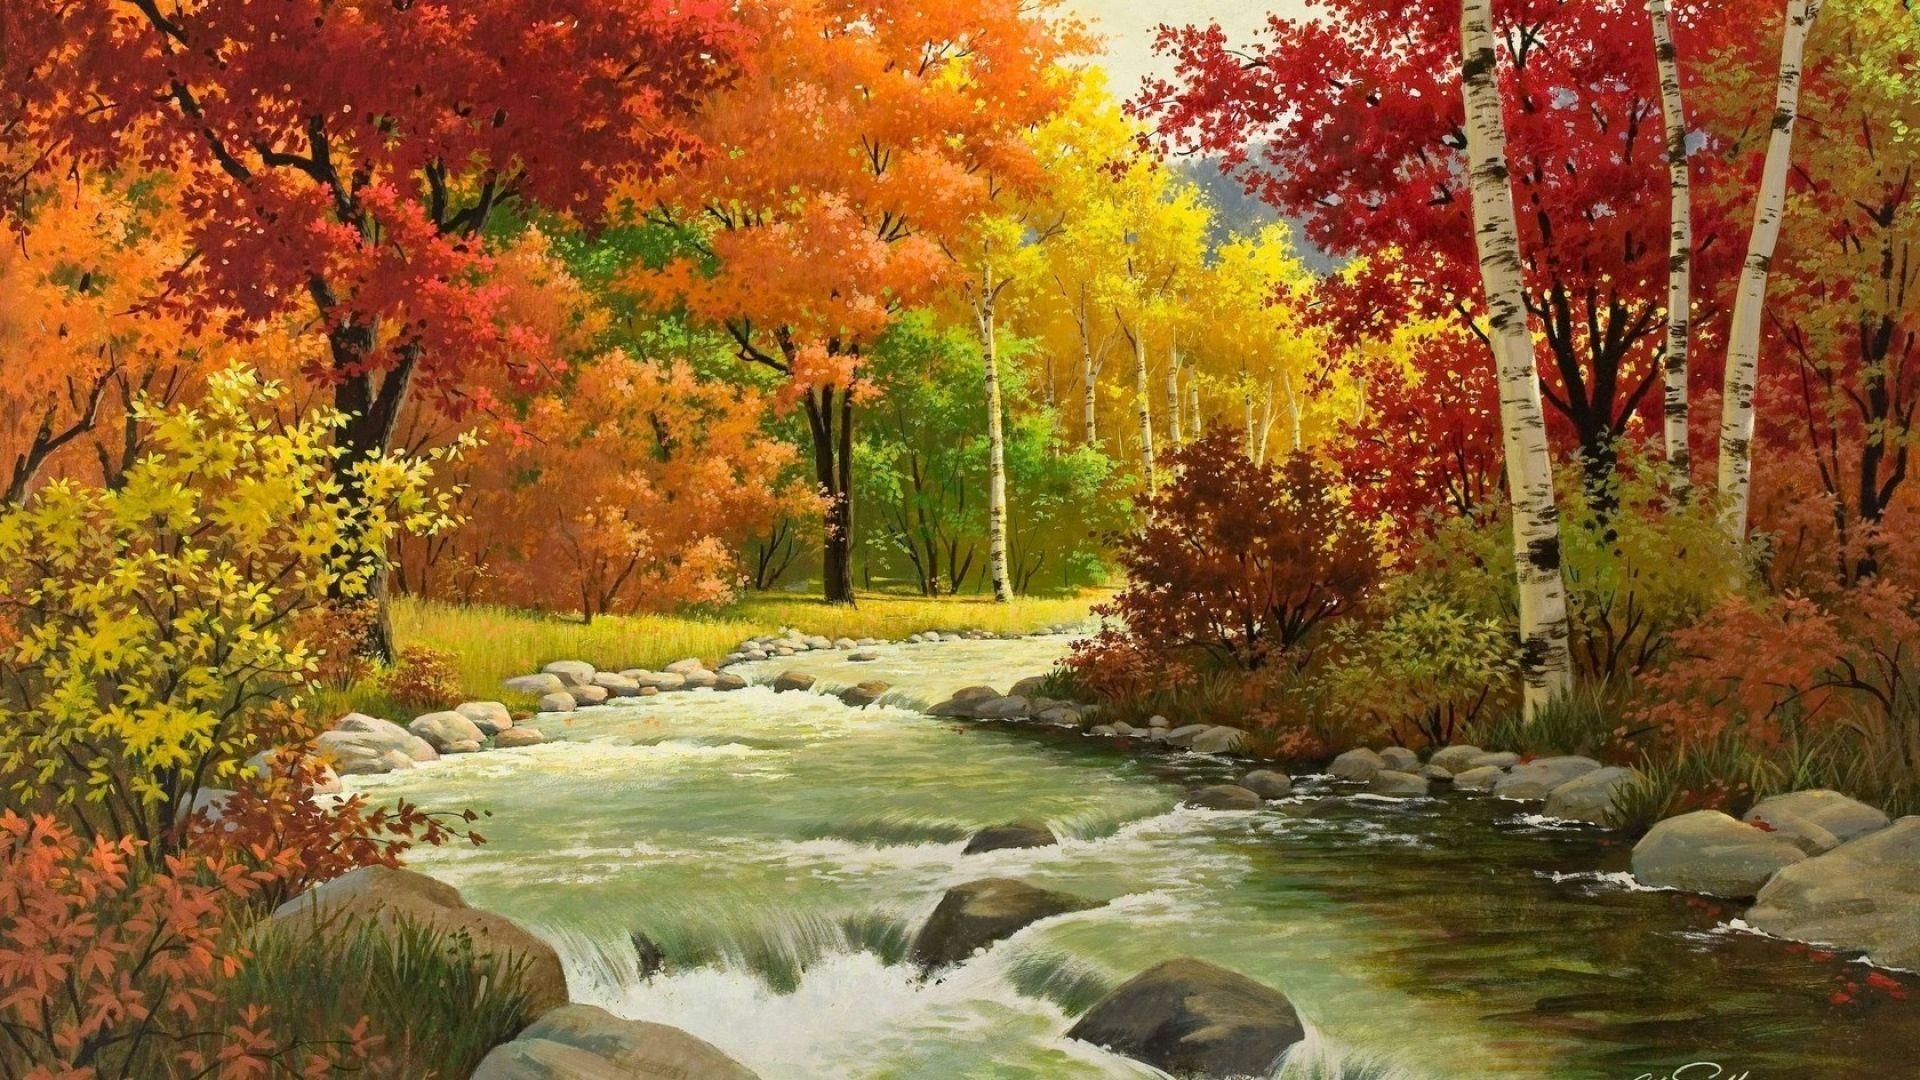 Full HD 1080p Autumn Wallpapers HD, Desktop Backgrounds .